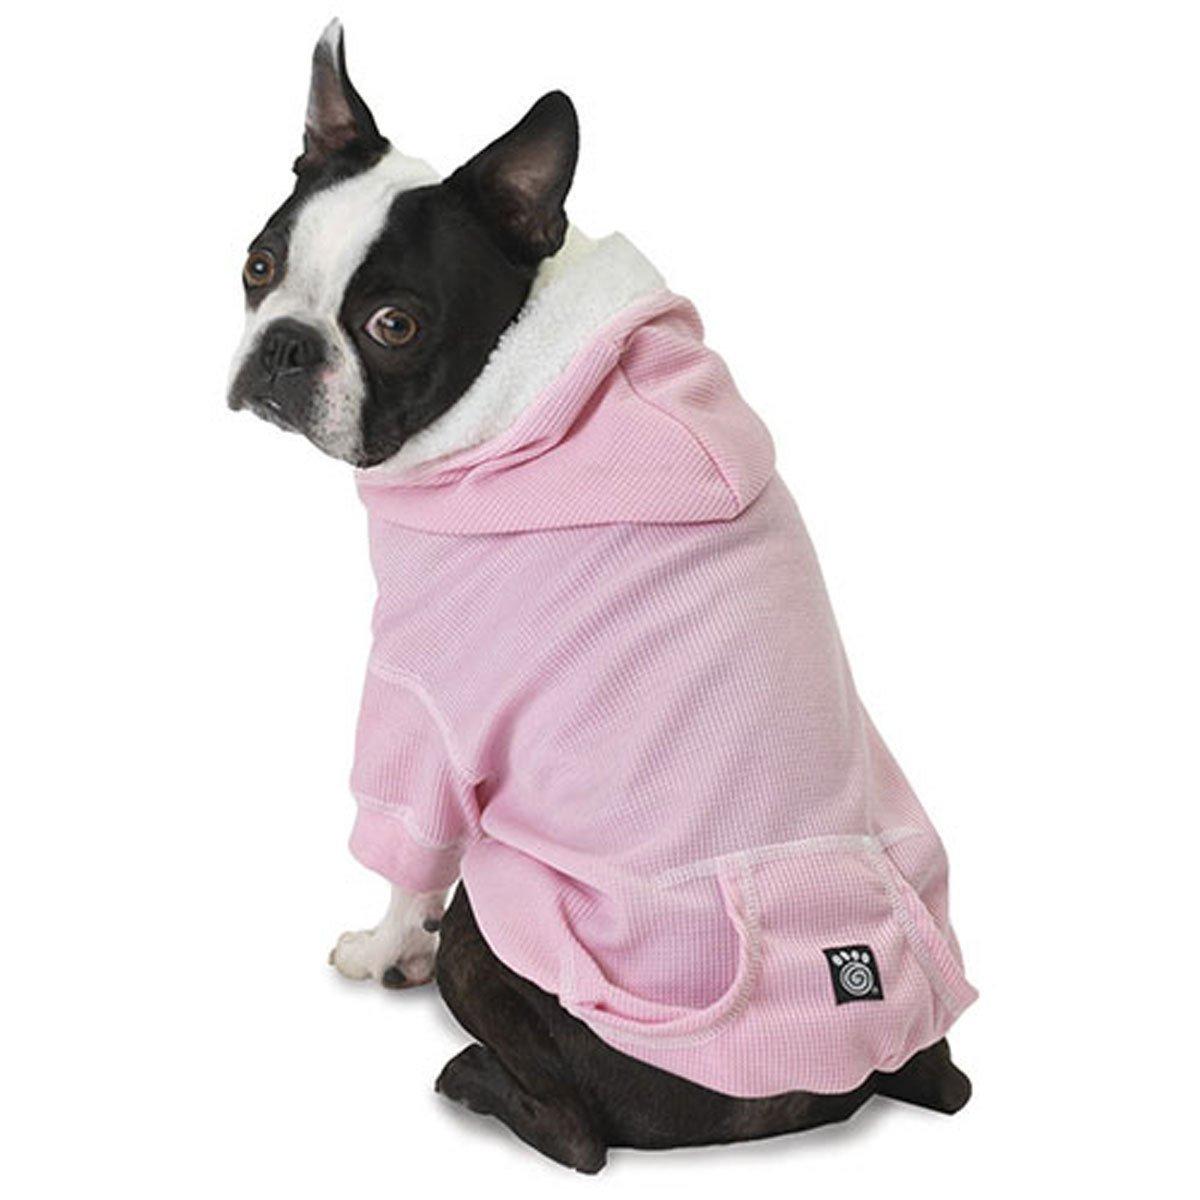 Bentley's Fur Trimmed Pink Dog Hoodie - Small